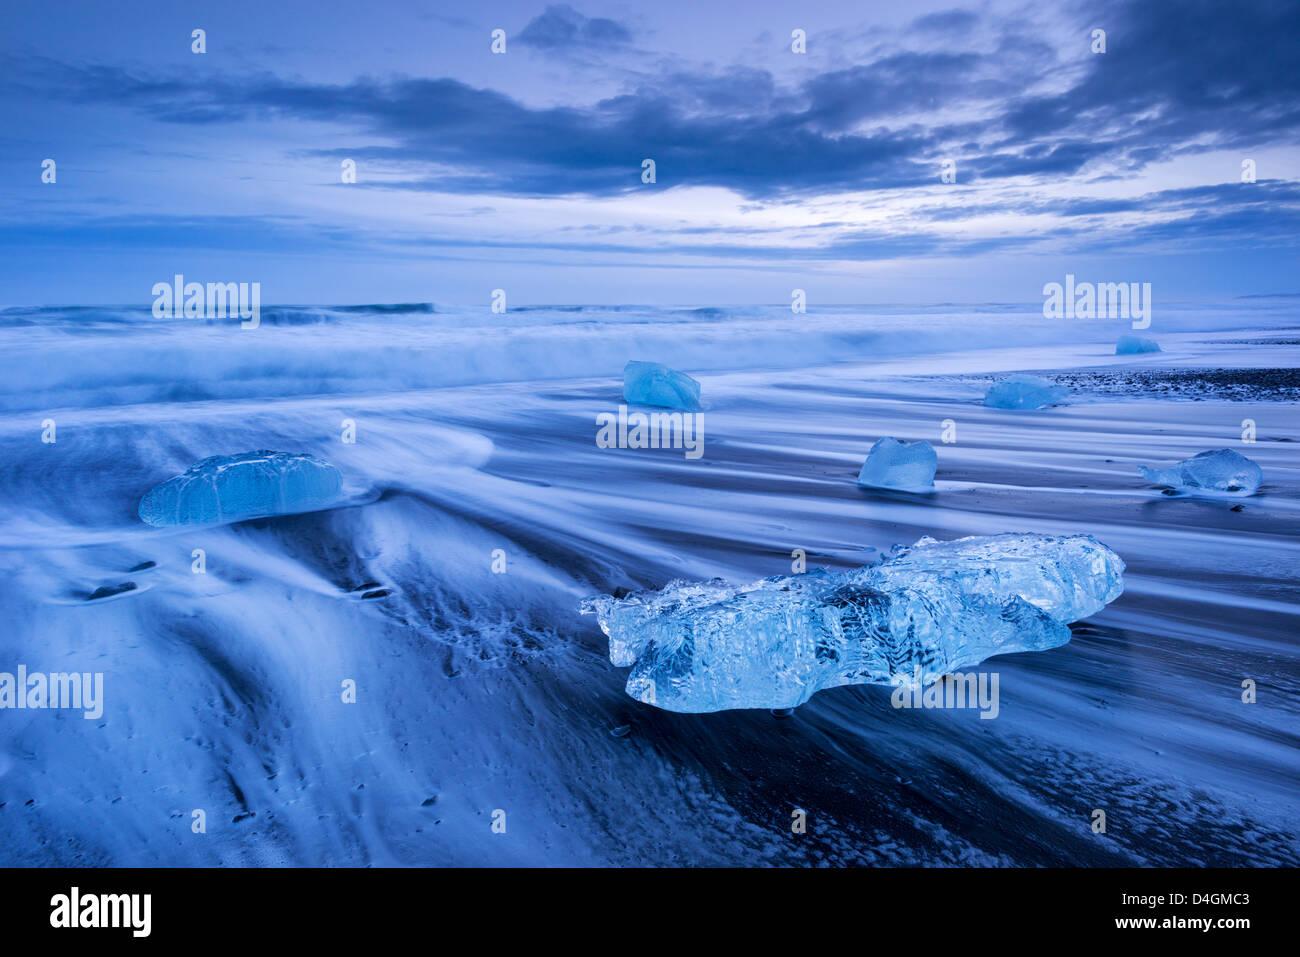 Ice and waves on Jokulsarlon Beach, South Iceland. Winter (January) 2013. - Stock Image